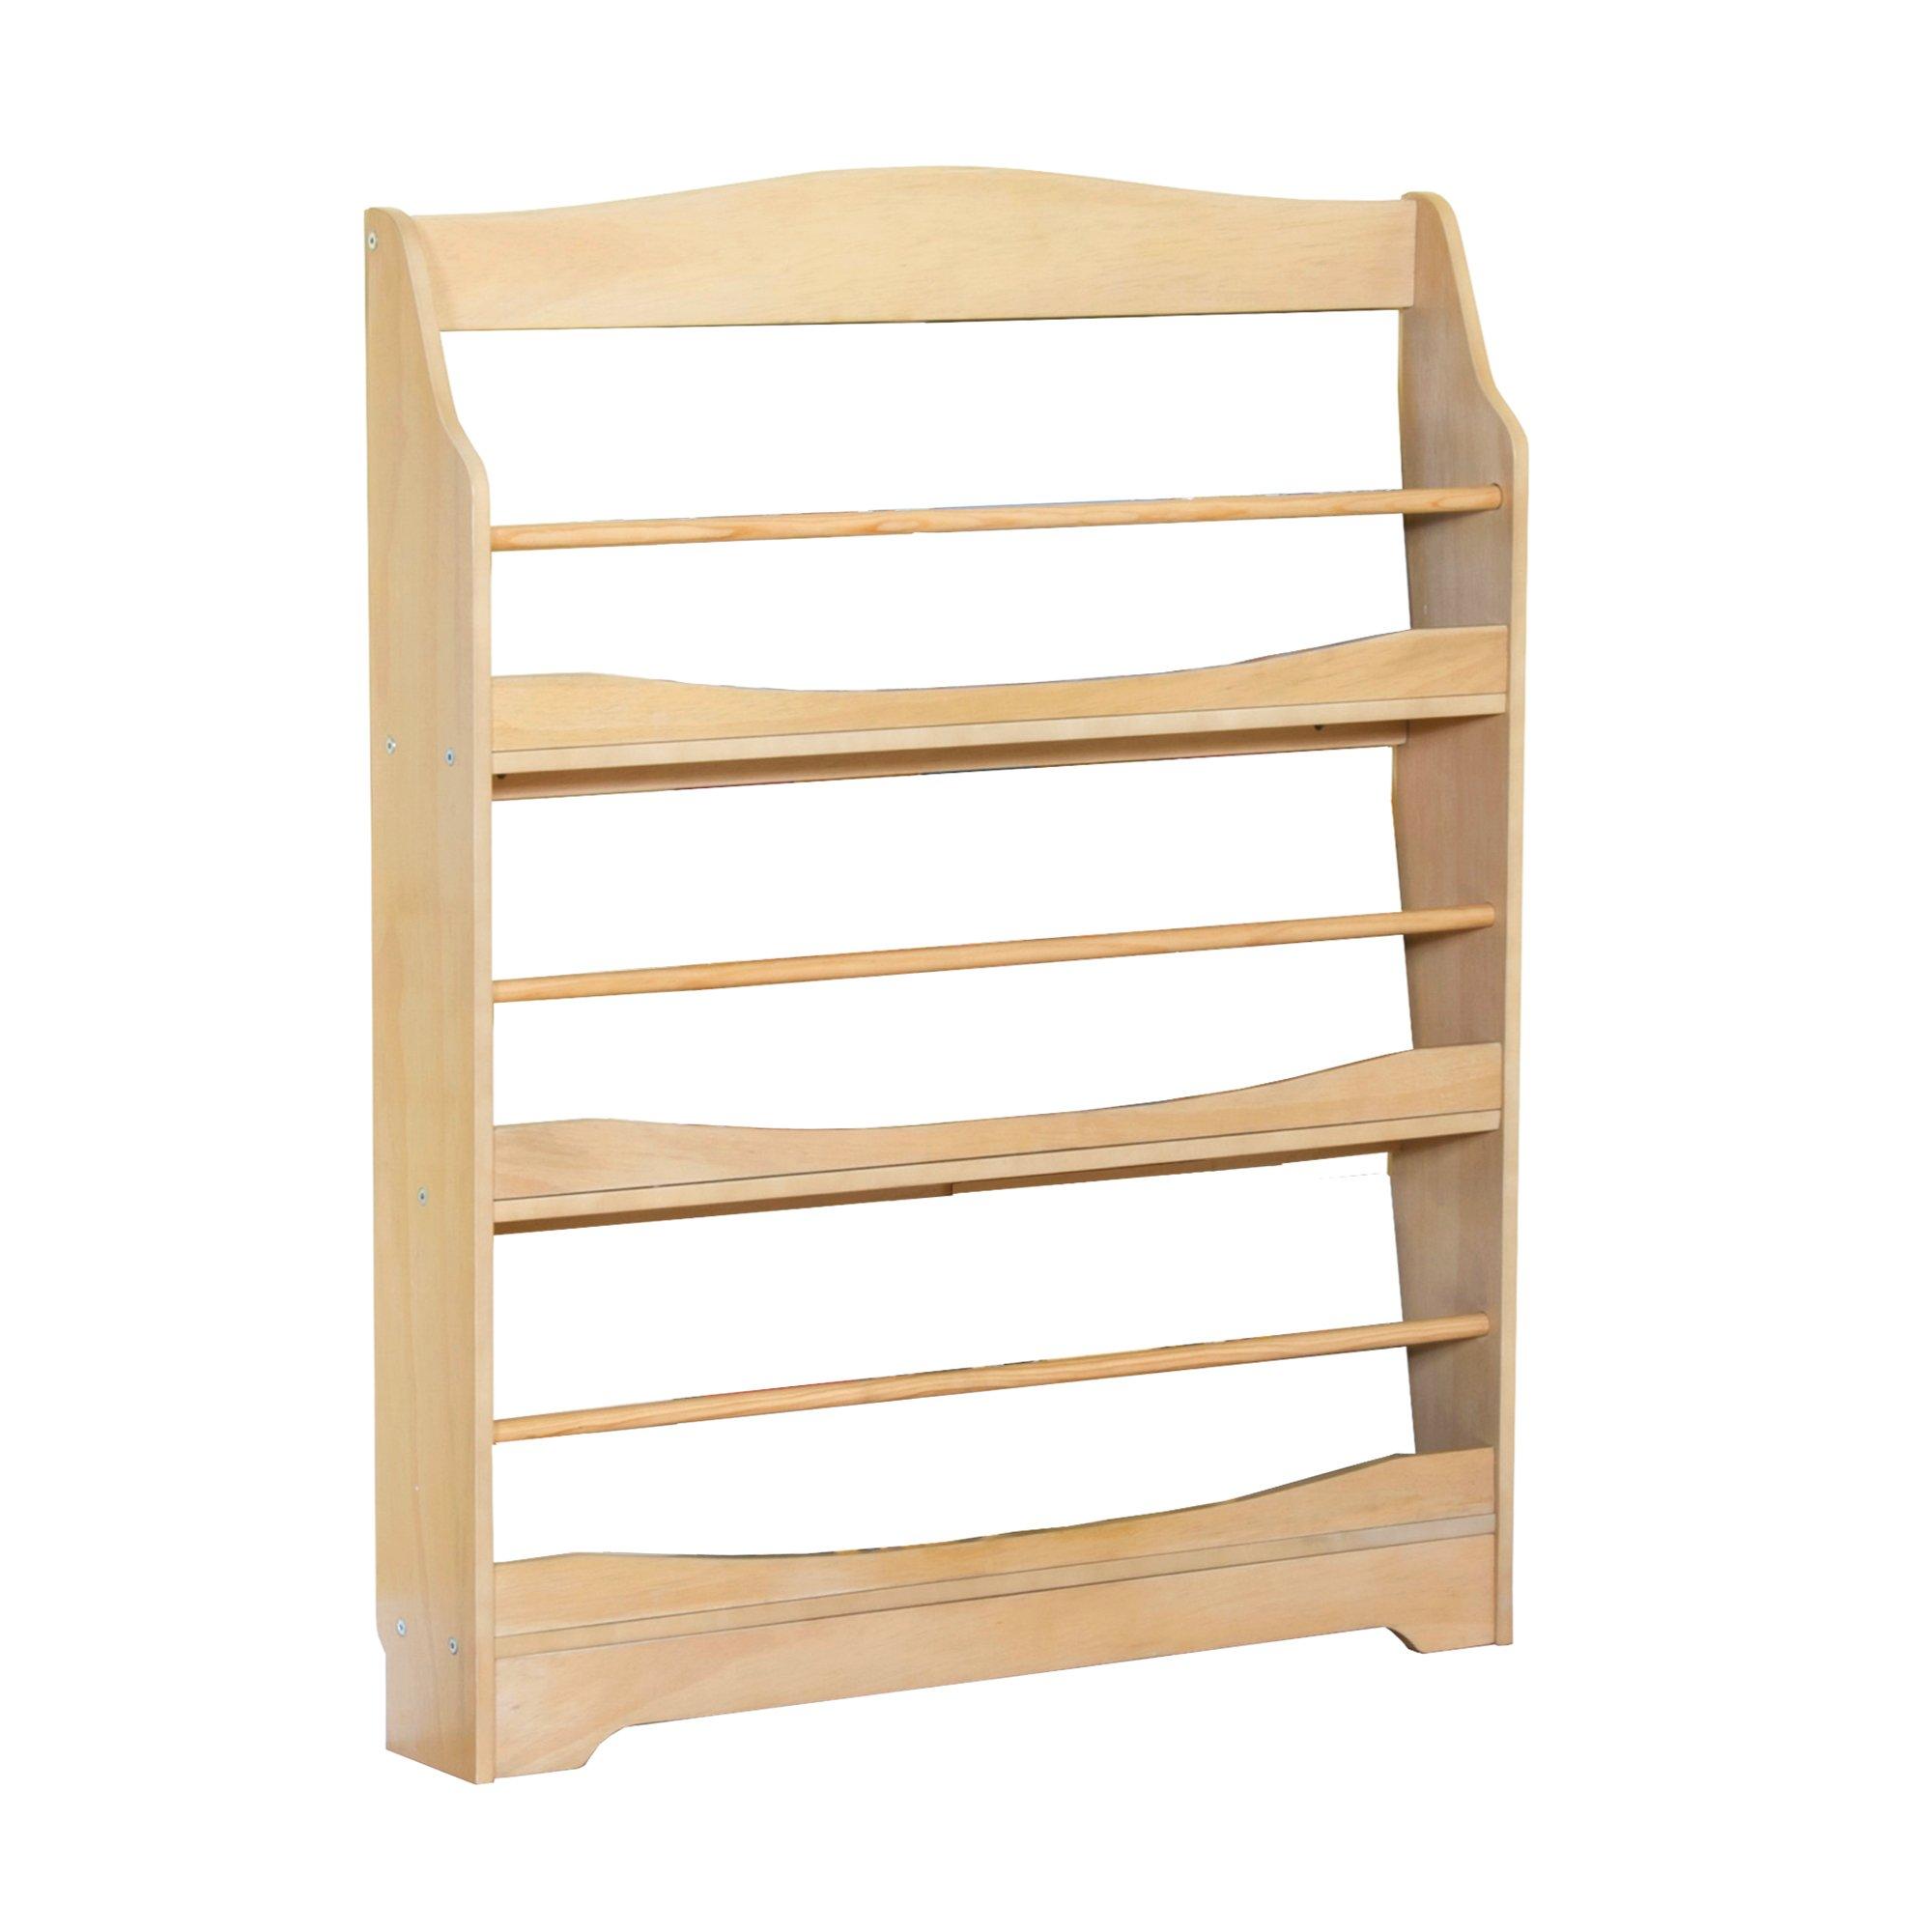 Guidecraft Expressions Natural Bookrack - Storage Bookshelf Kids School Furniture